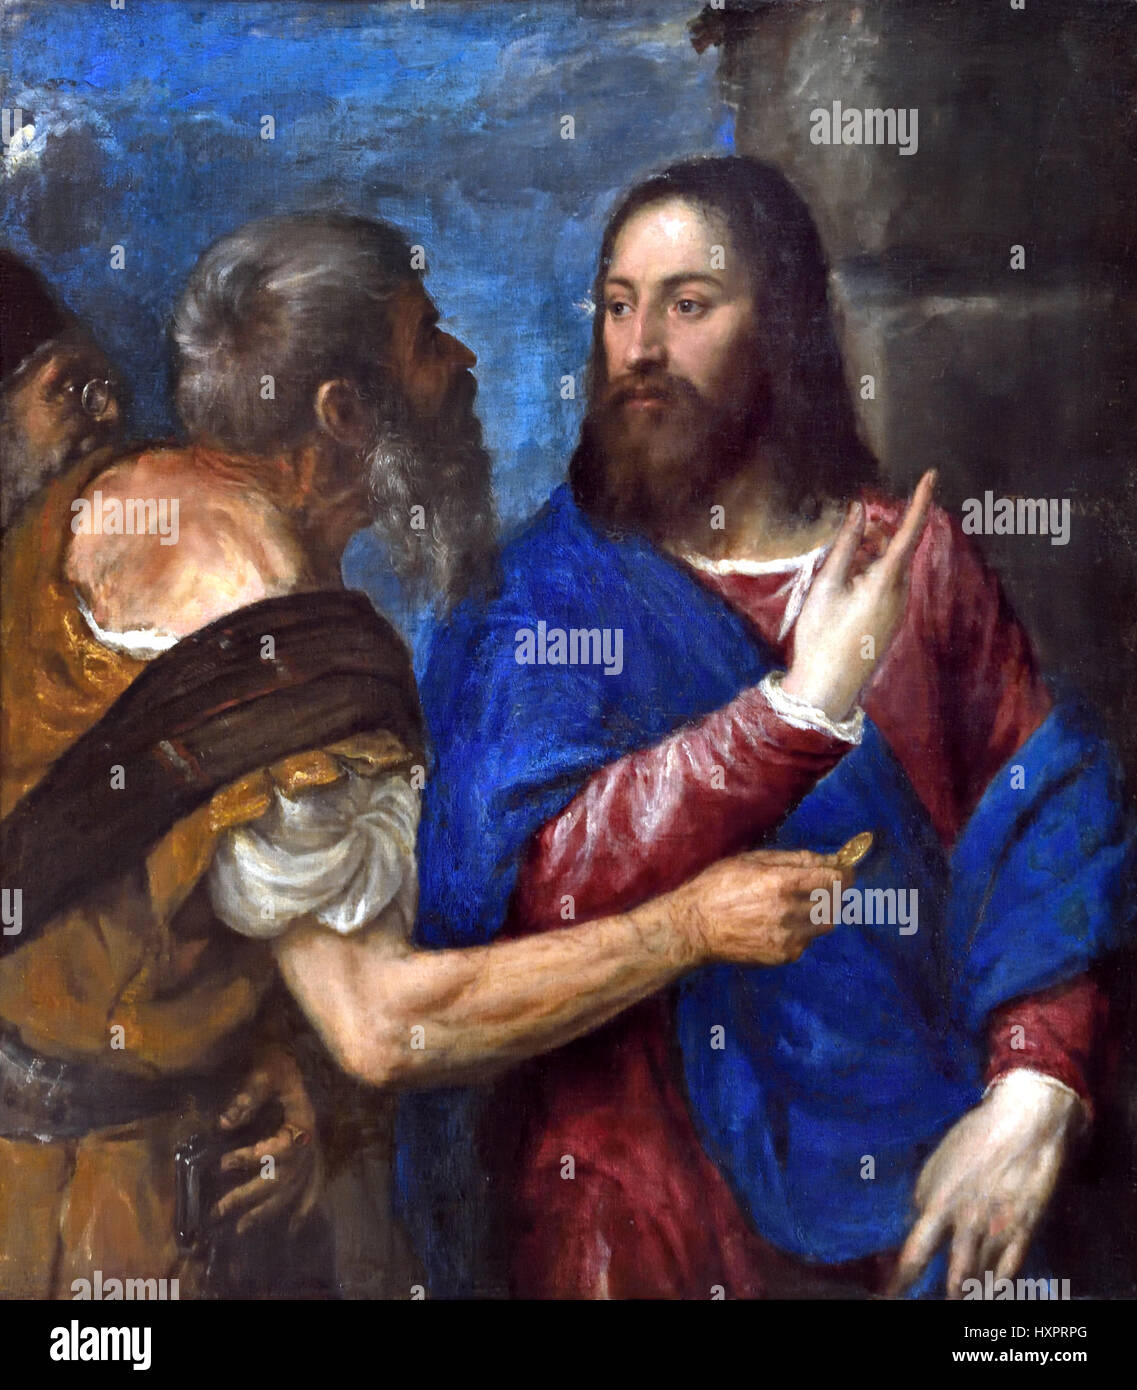 Der Tribut MoneyTitian 1560-8 Tiziano Vecelli oder Tiziano Vecellio1490 ? 1576) Tizian italienischer Maler aus dem Stockbild